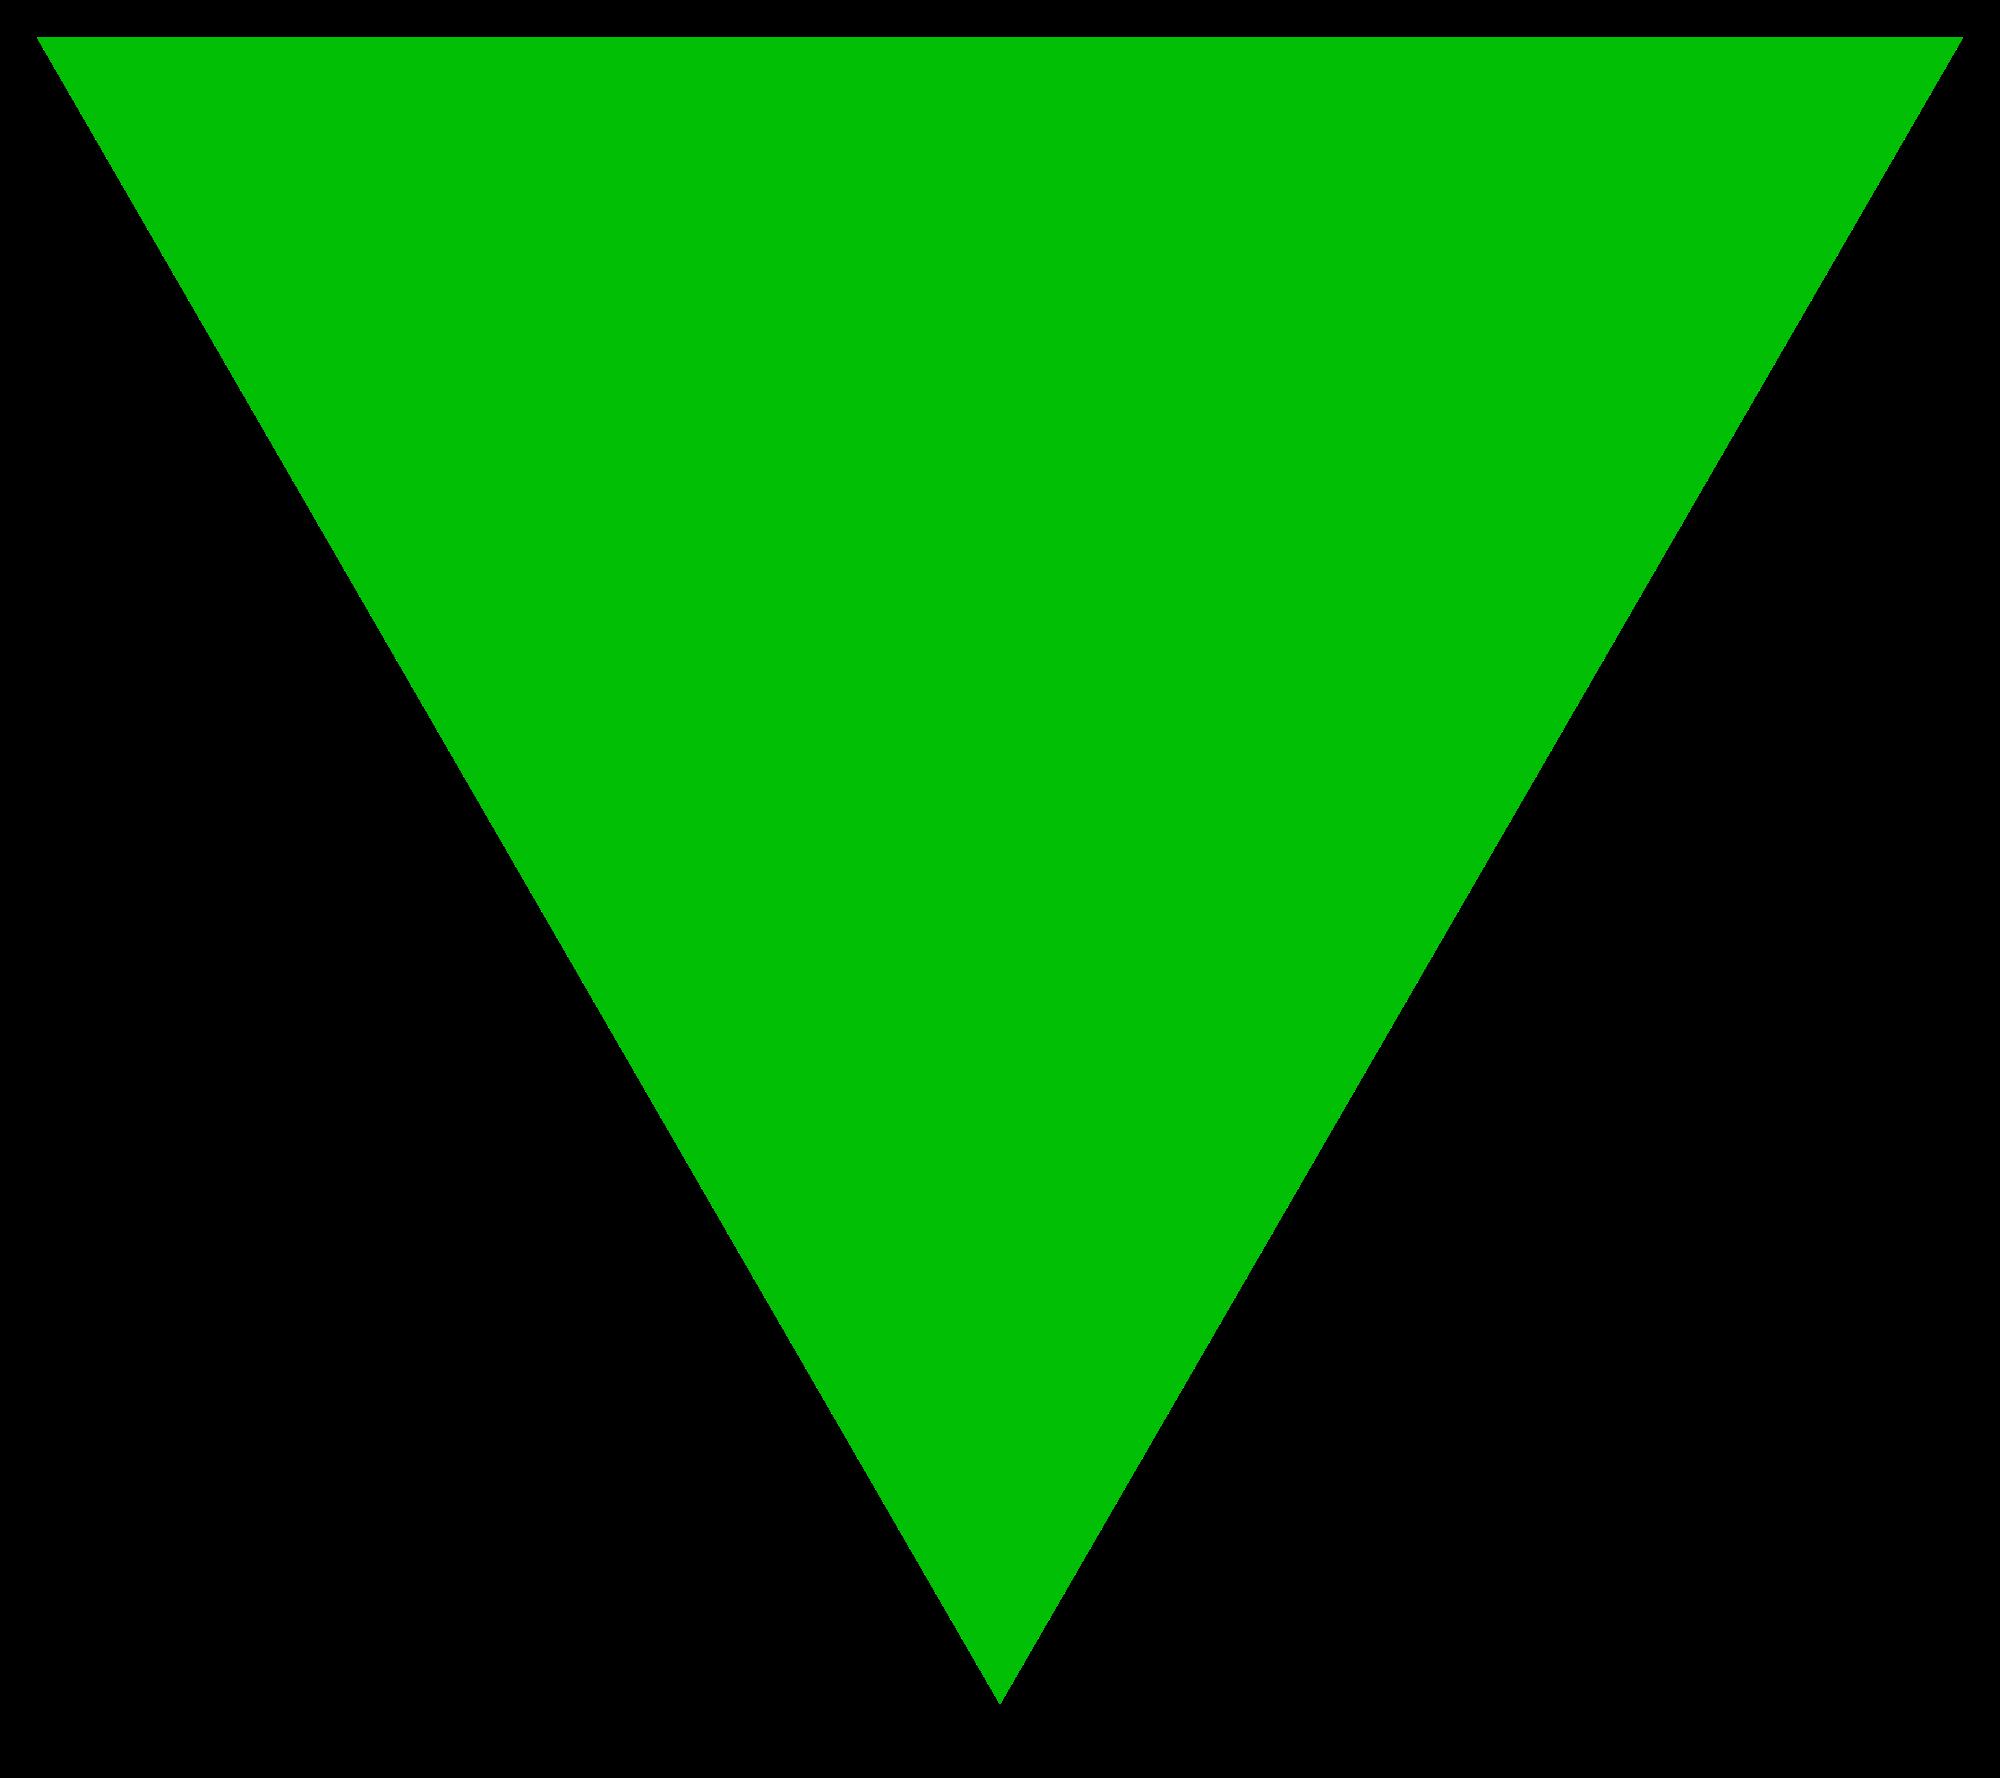 triangular clipart upside down